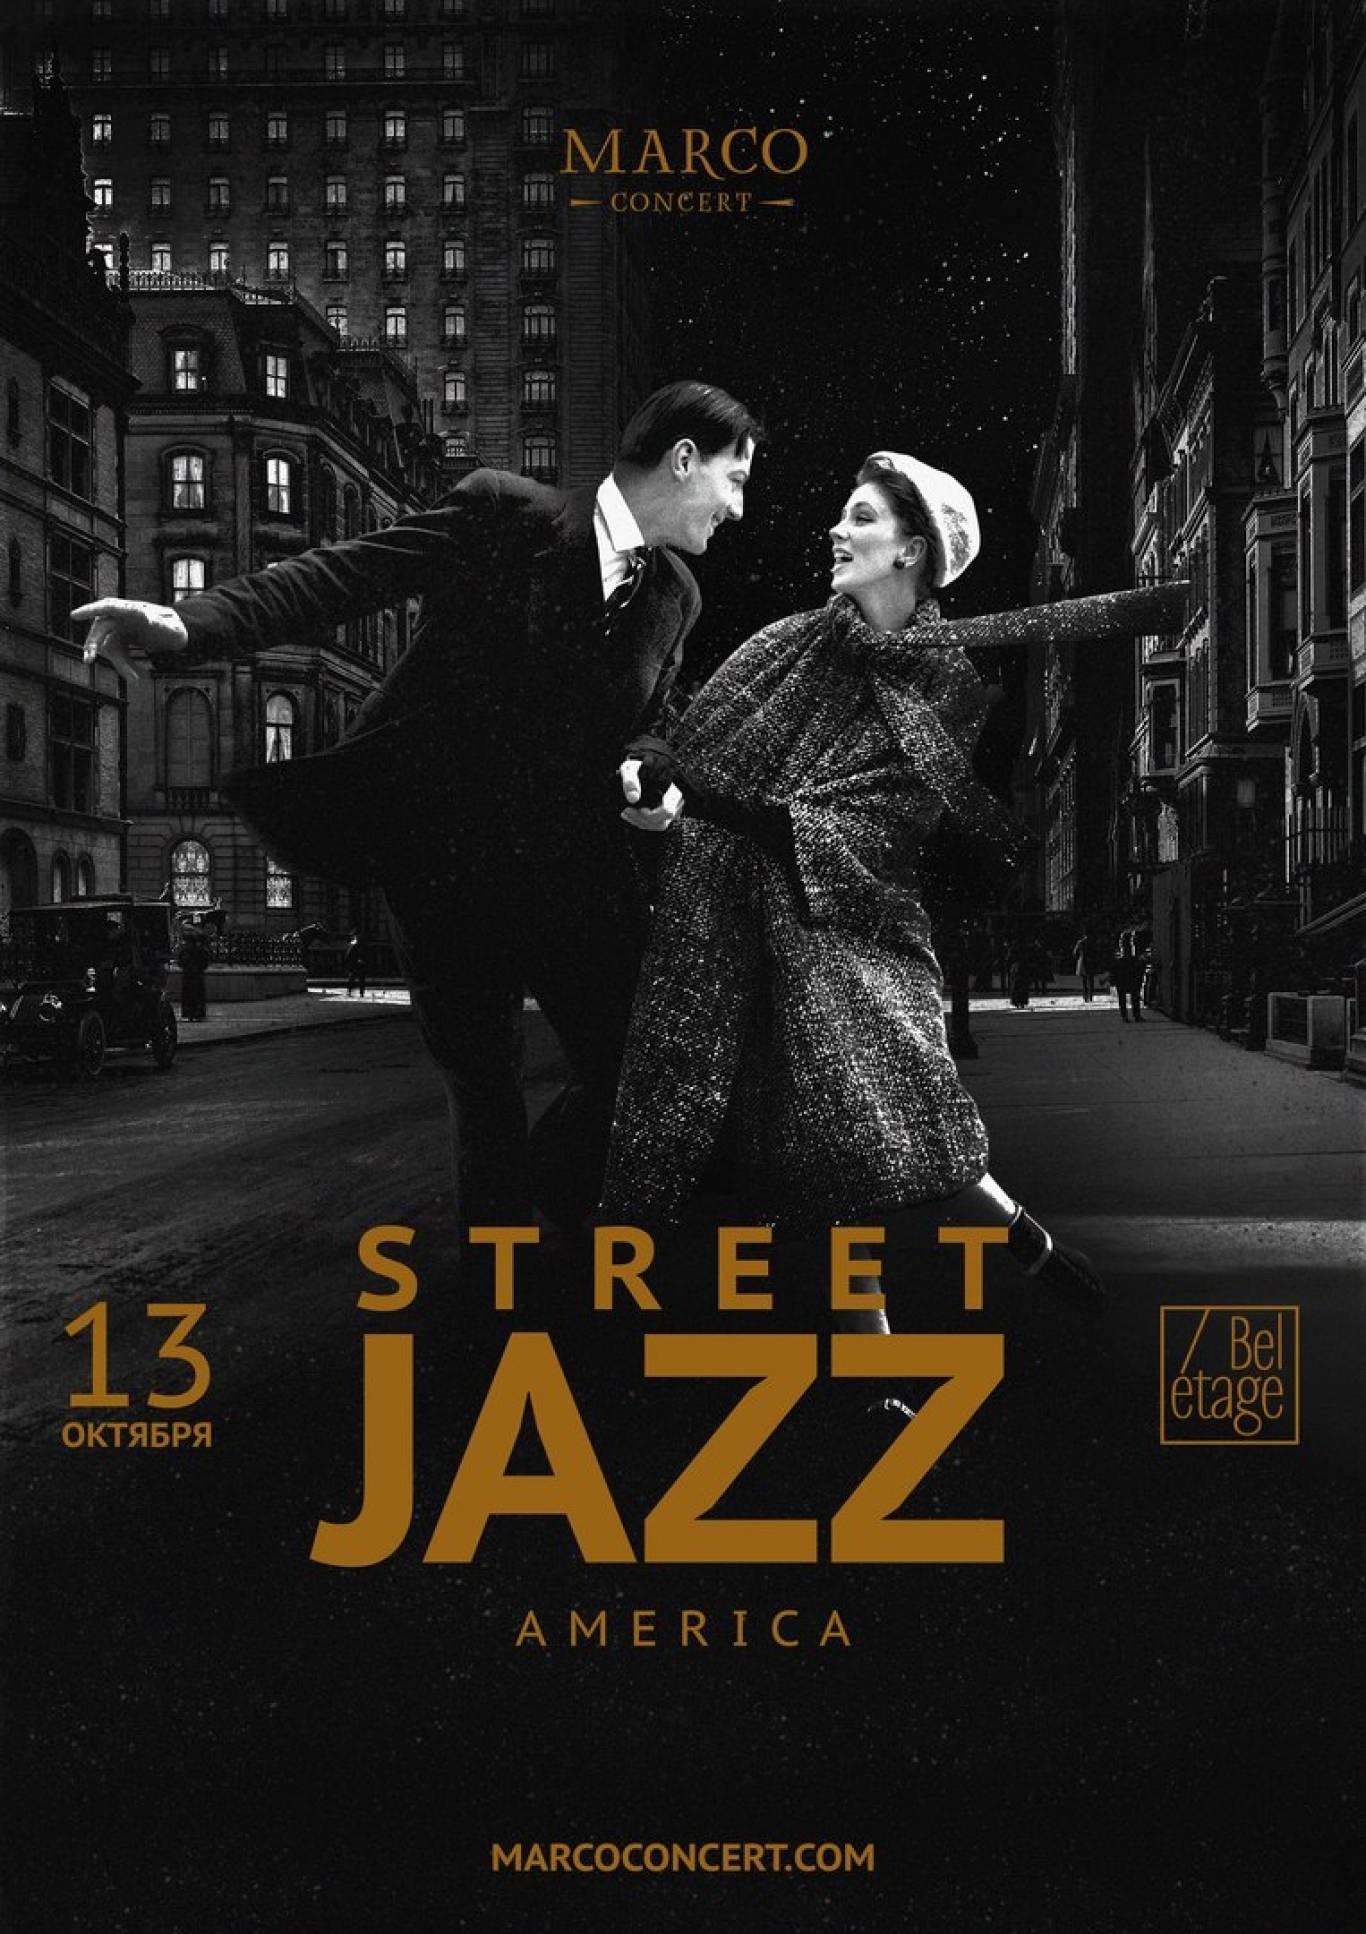 Street jazz: America